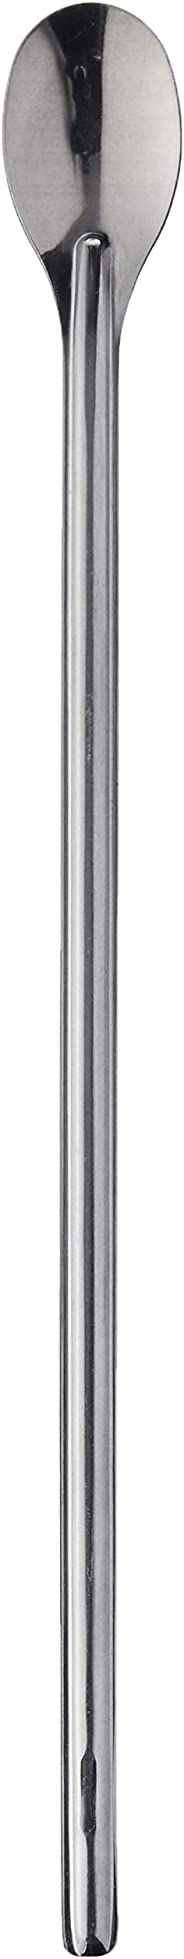 Colher para Coquetel Arienzo Se Brinox Aço Inox 30.5cm